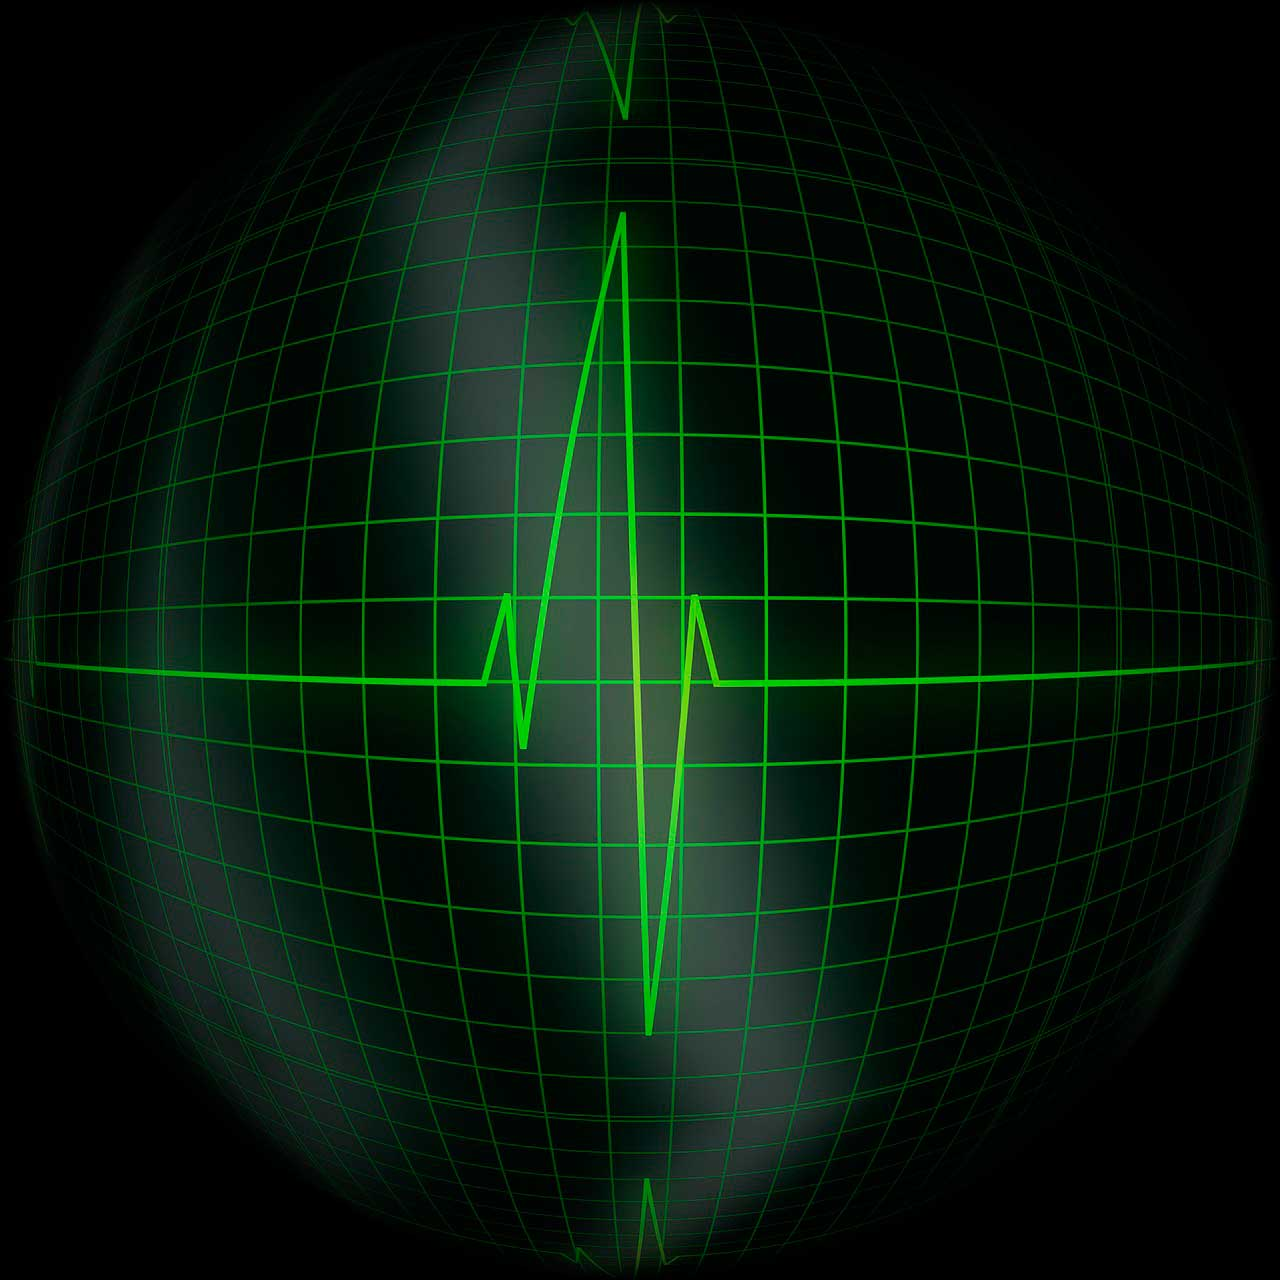 Image: Plataforma de Telemedicina en el manejo integral del linfedema del miembro superior post cáncer de mama